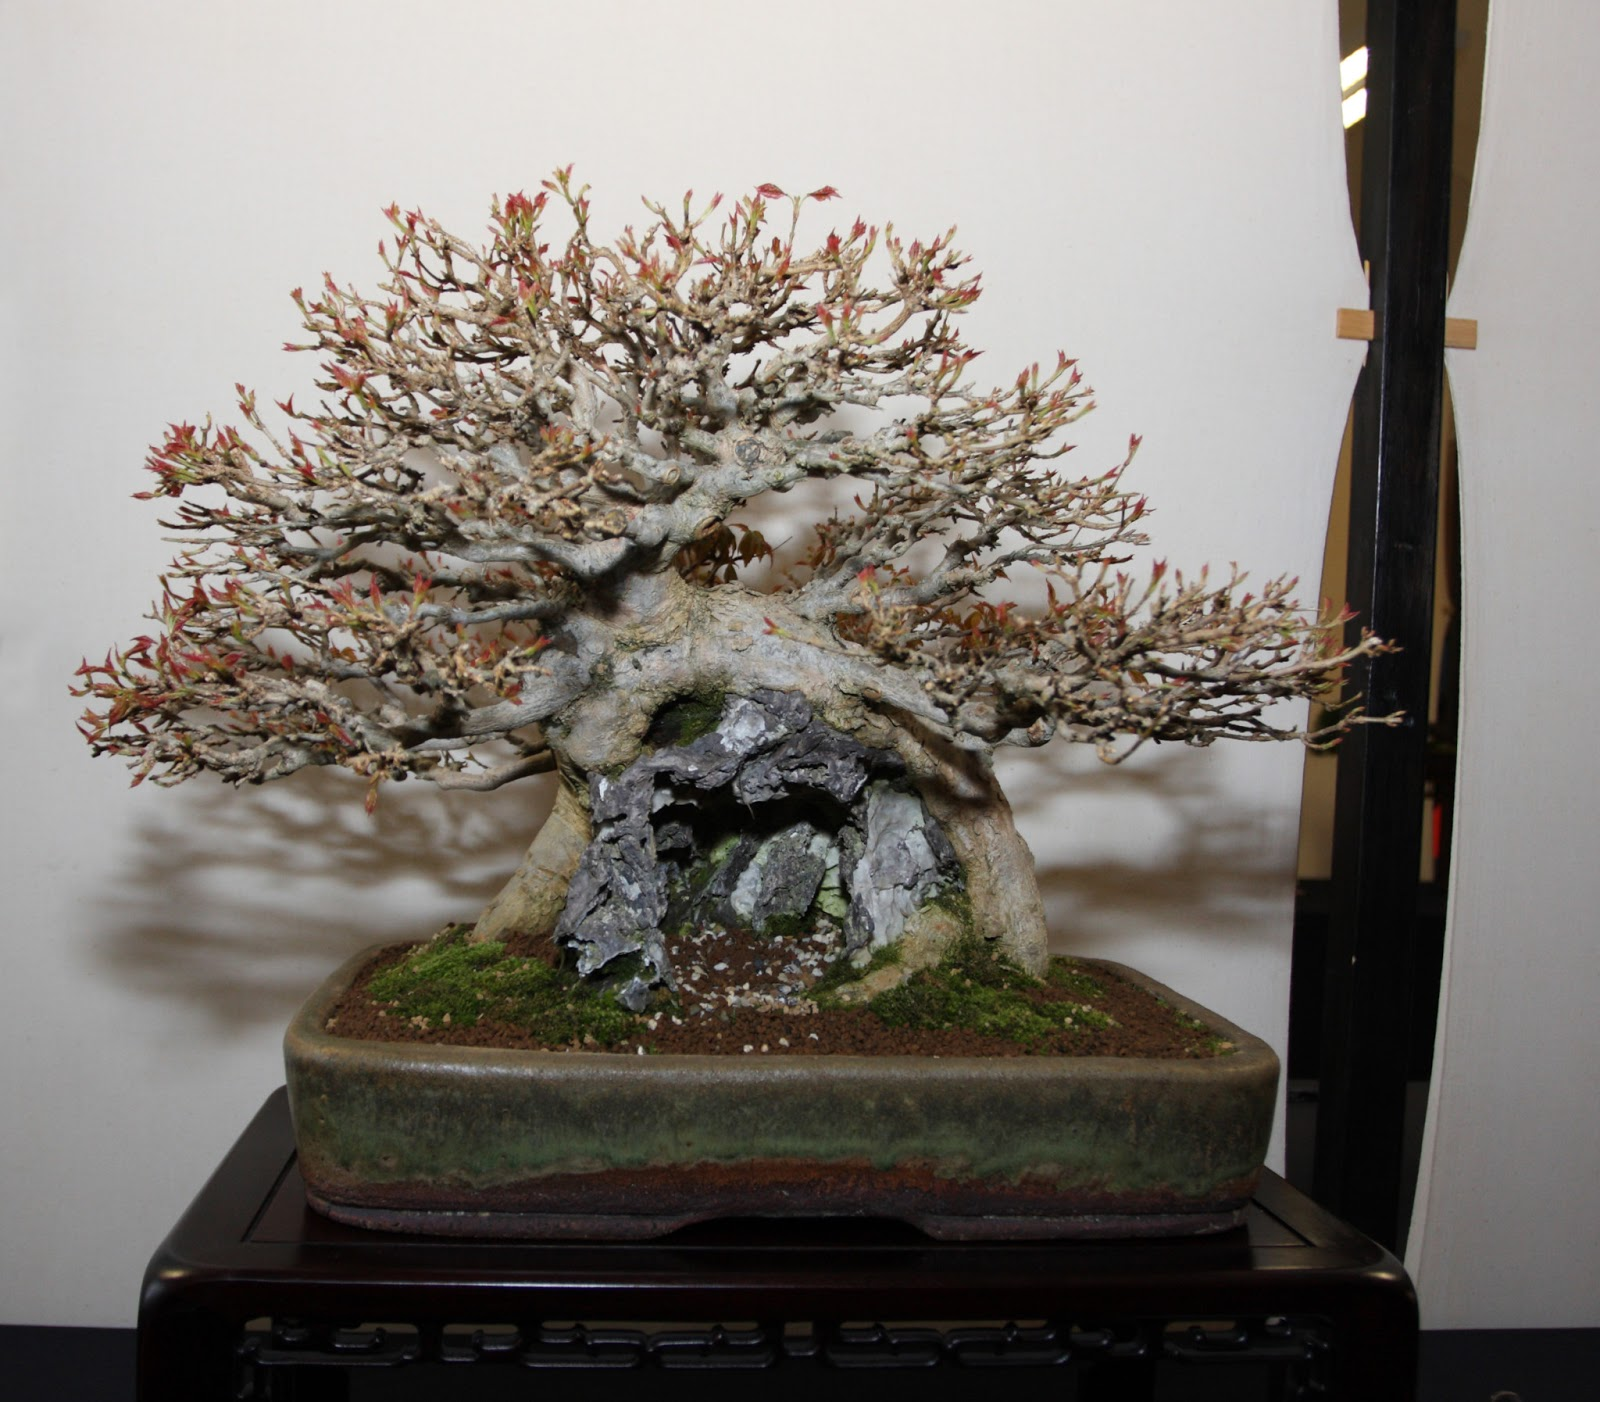 Steve Tolley39s Bonsai And Suiseki Blog April 2013